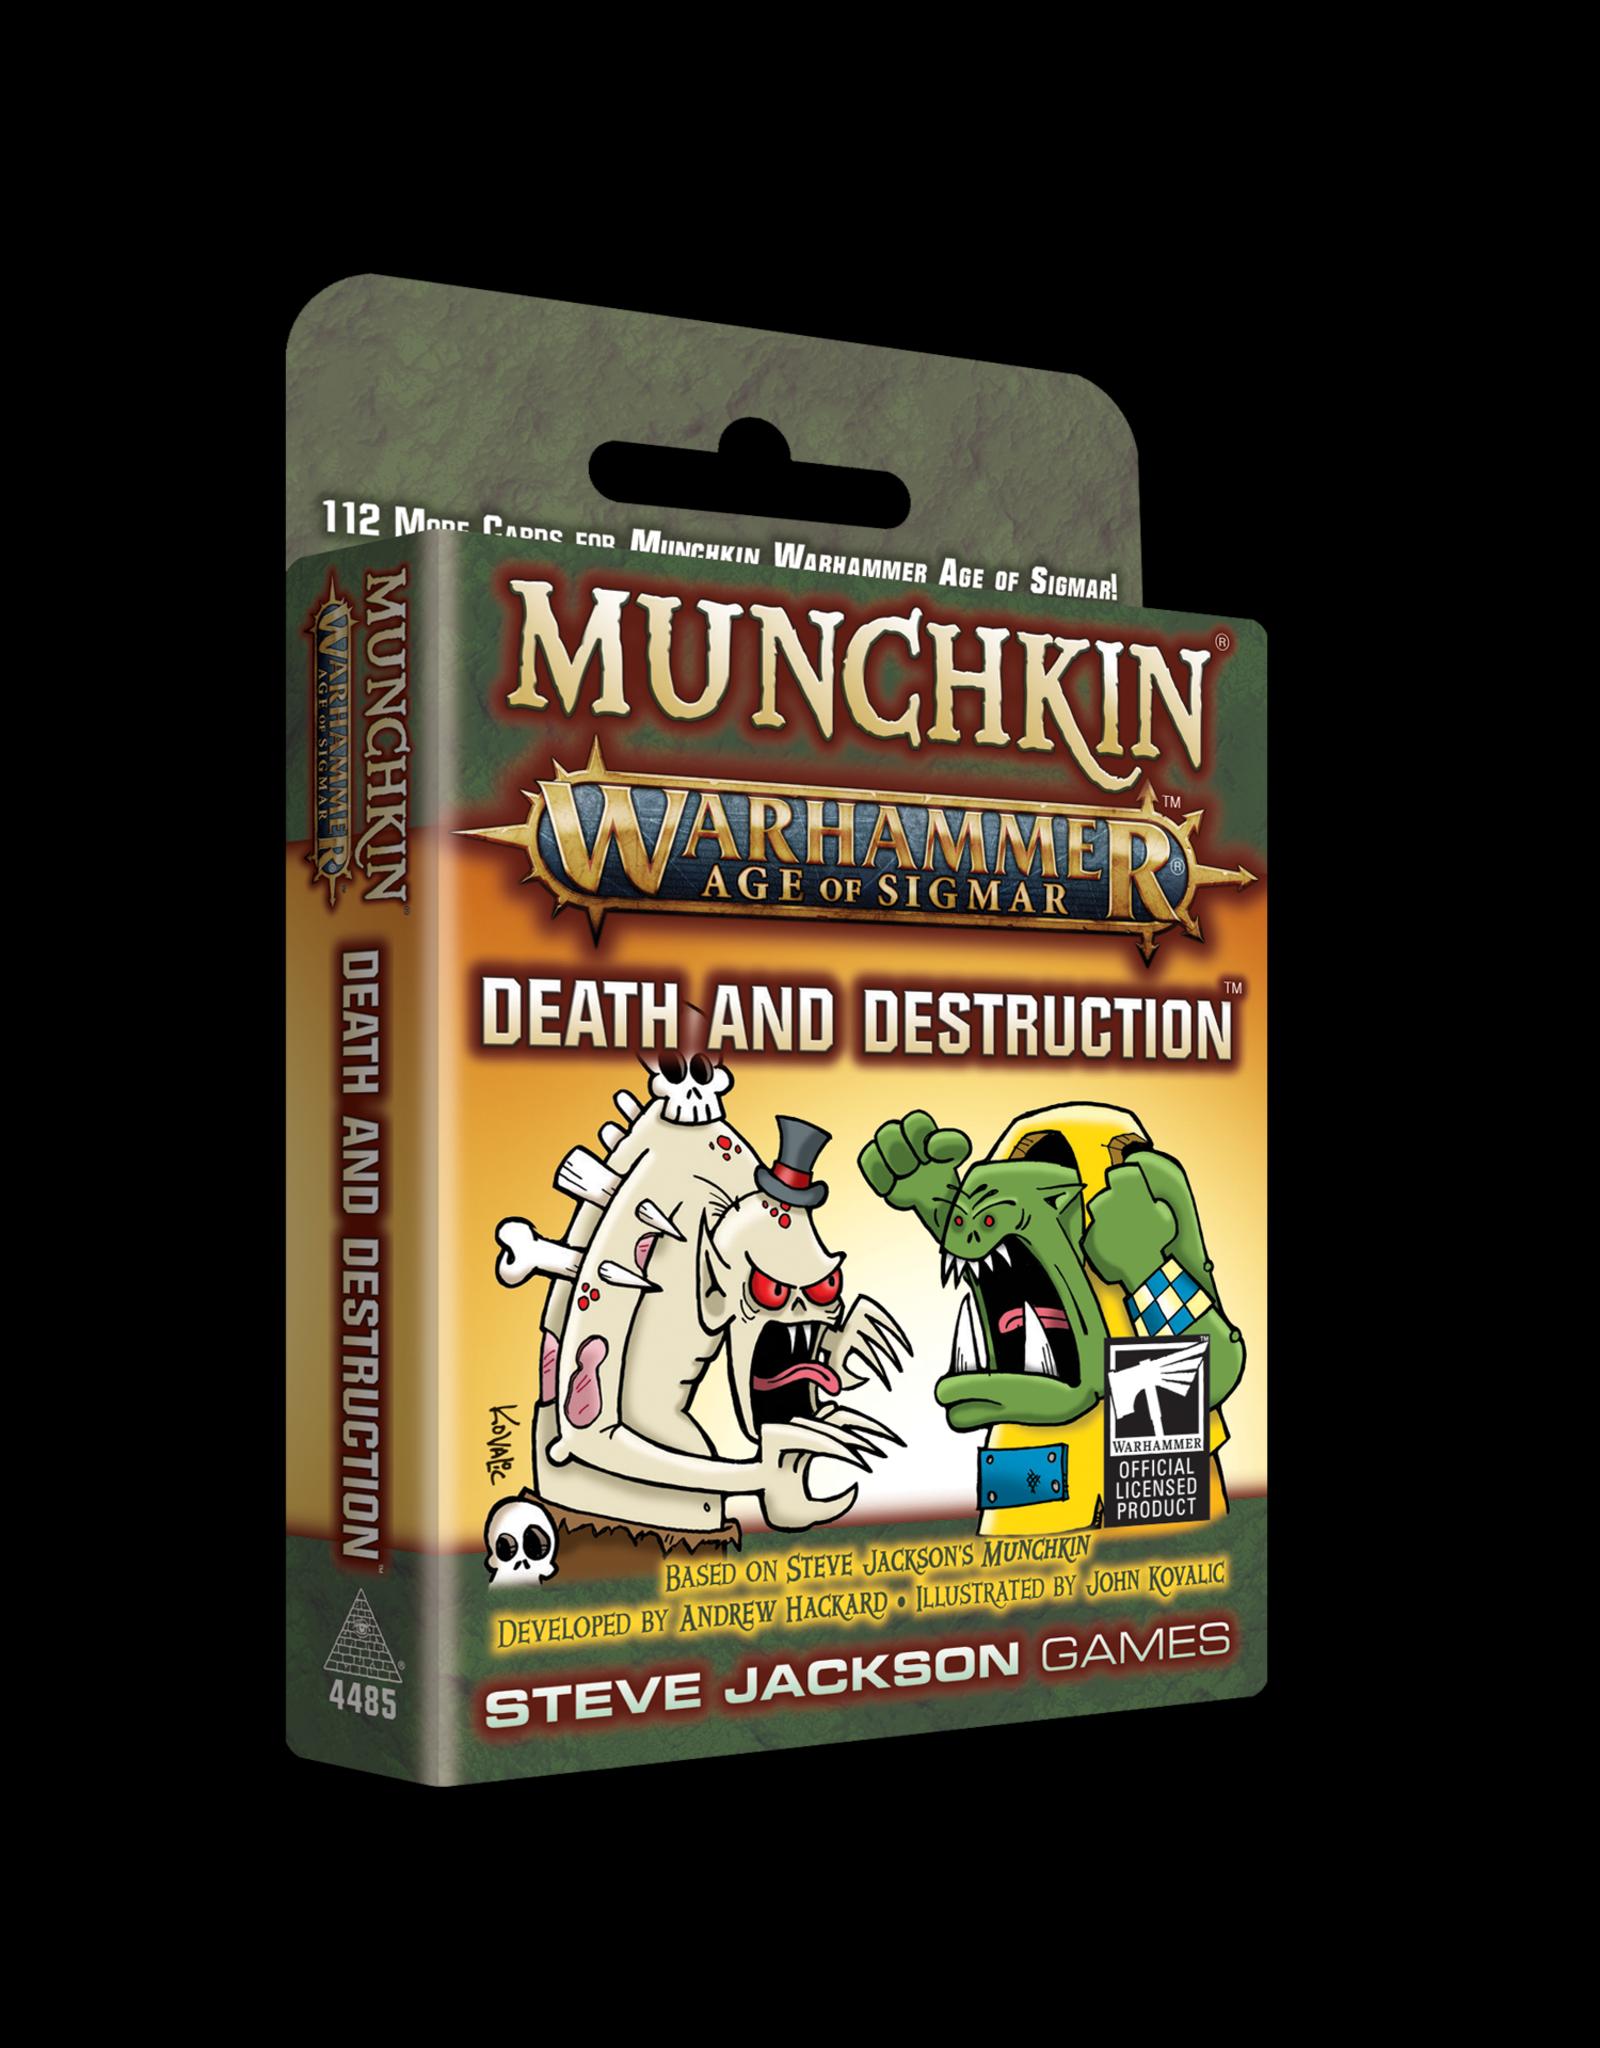 Steve Jackson Games Munchkin: Warhammer Age of Sigmar - Death and Destruction